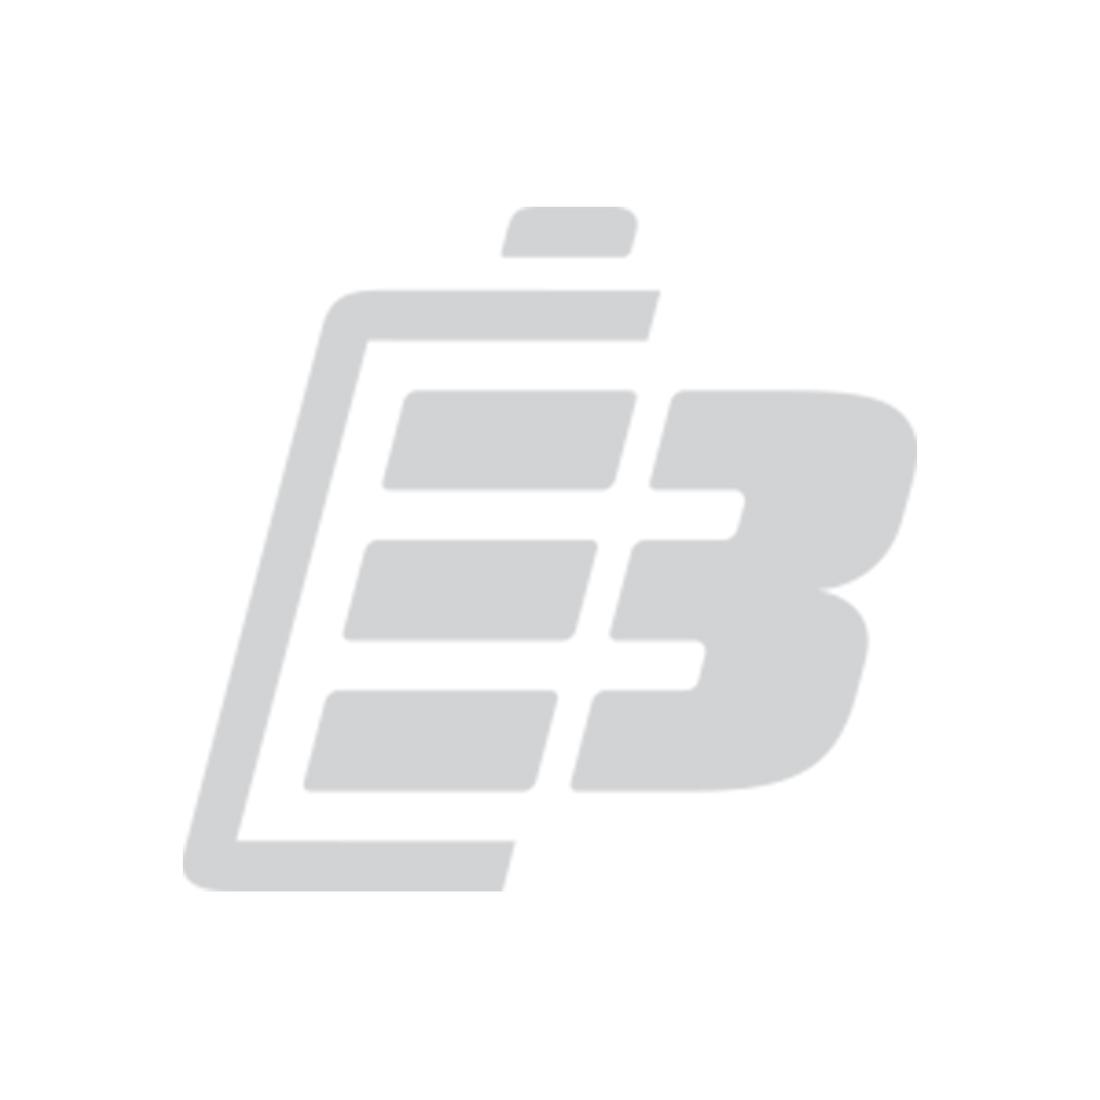 Power tool battery Dewalt 18V 3.0Ah_1